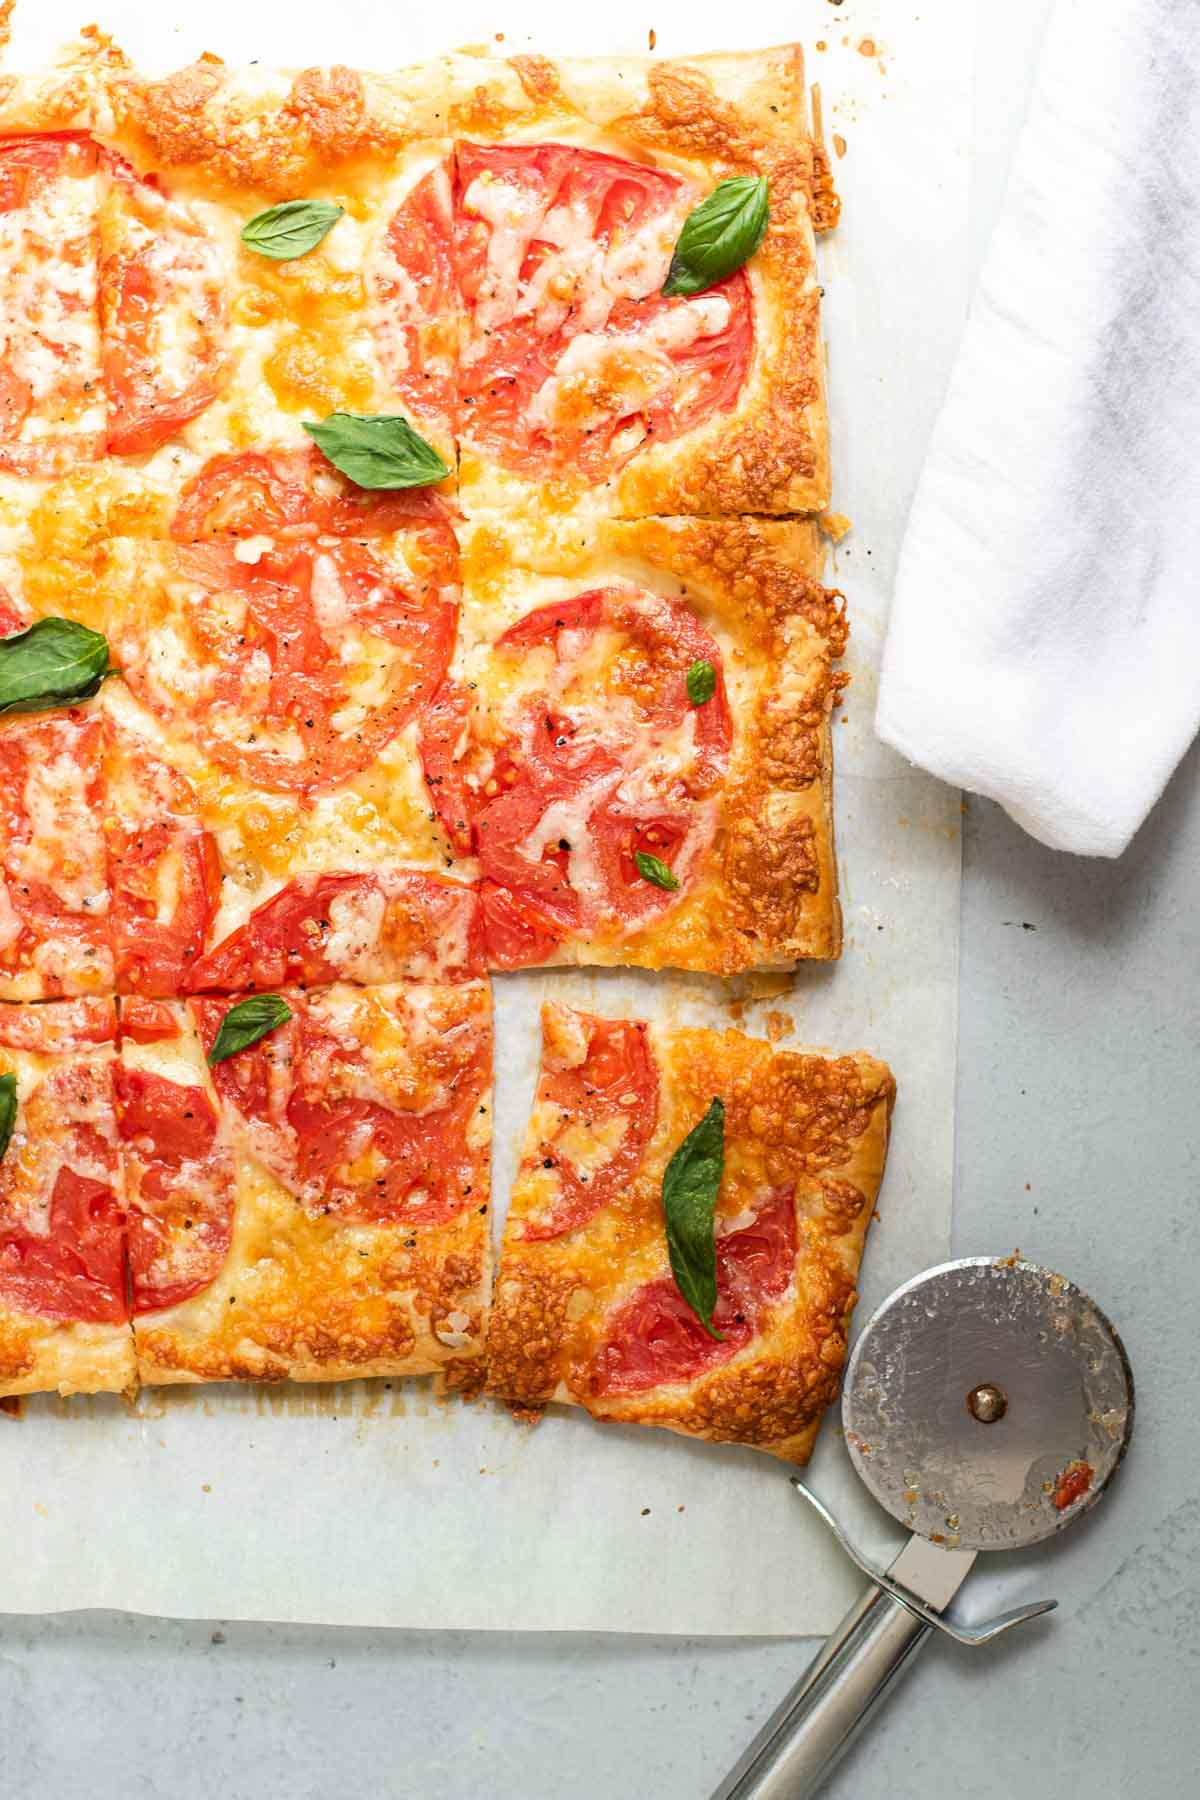 Tomato Cheese Tart with a white napkin and pizza wheel